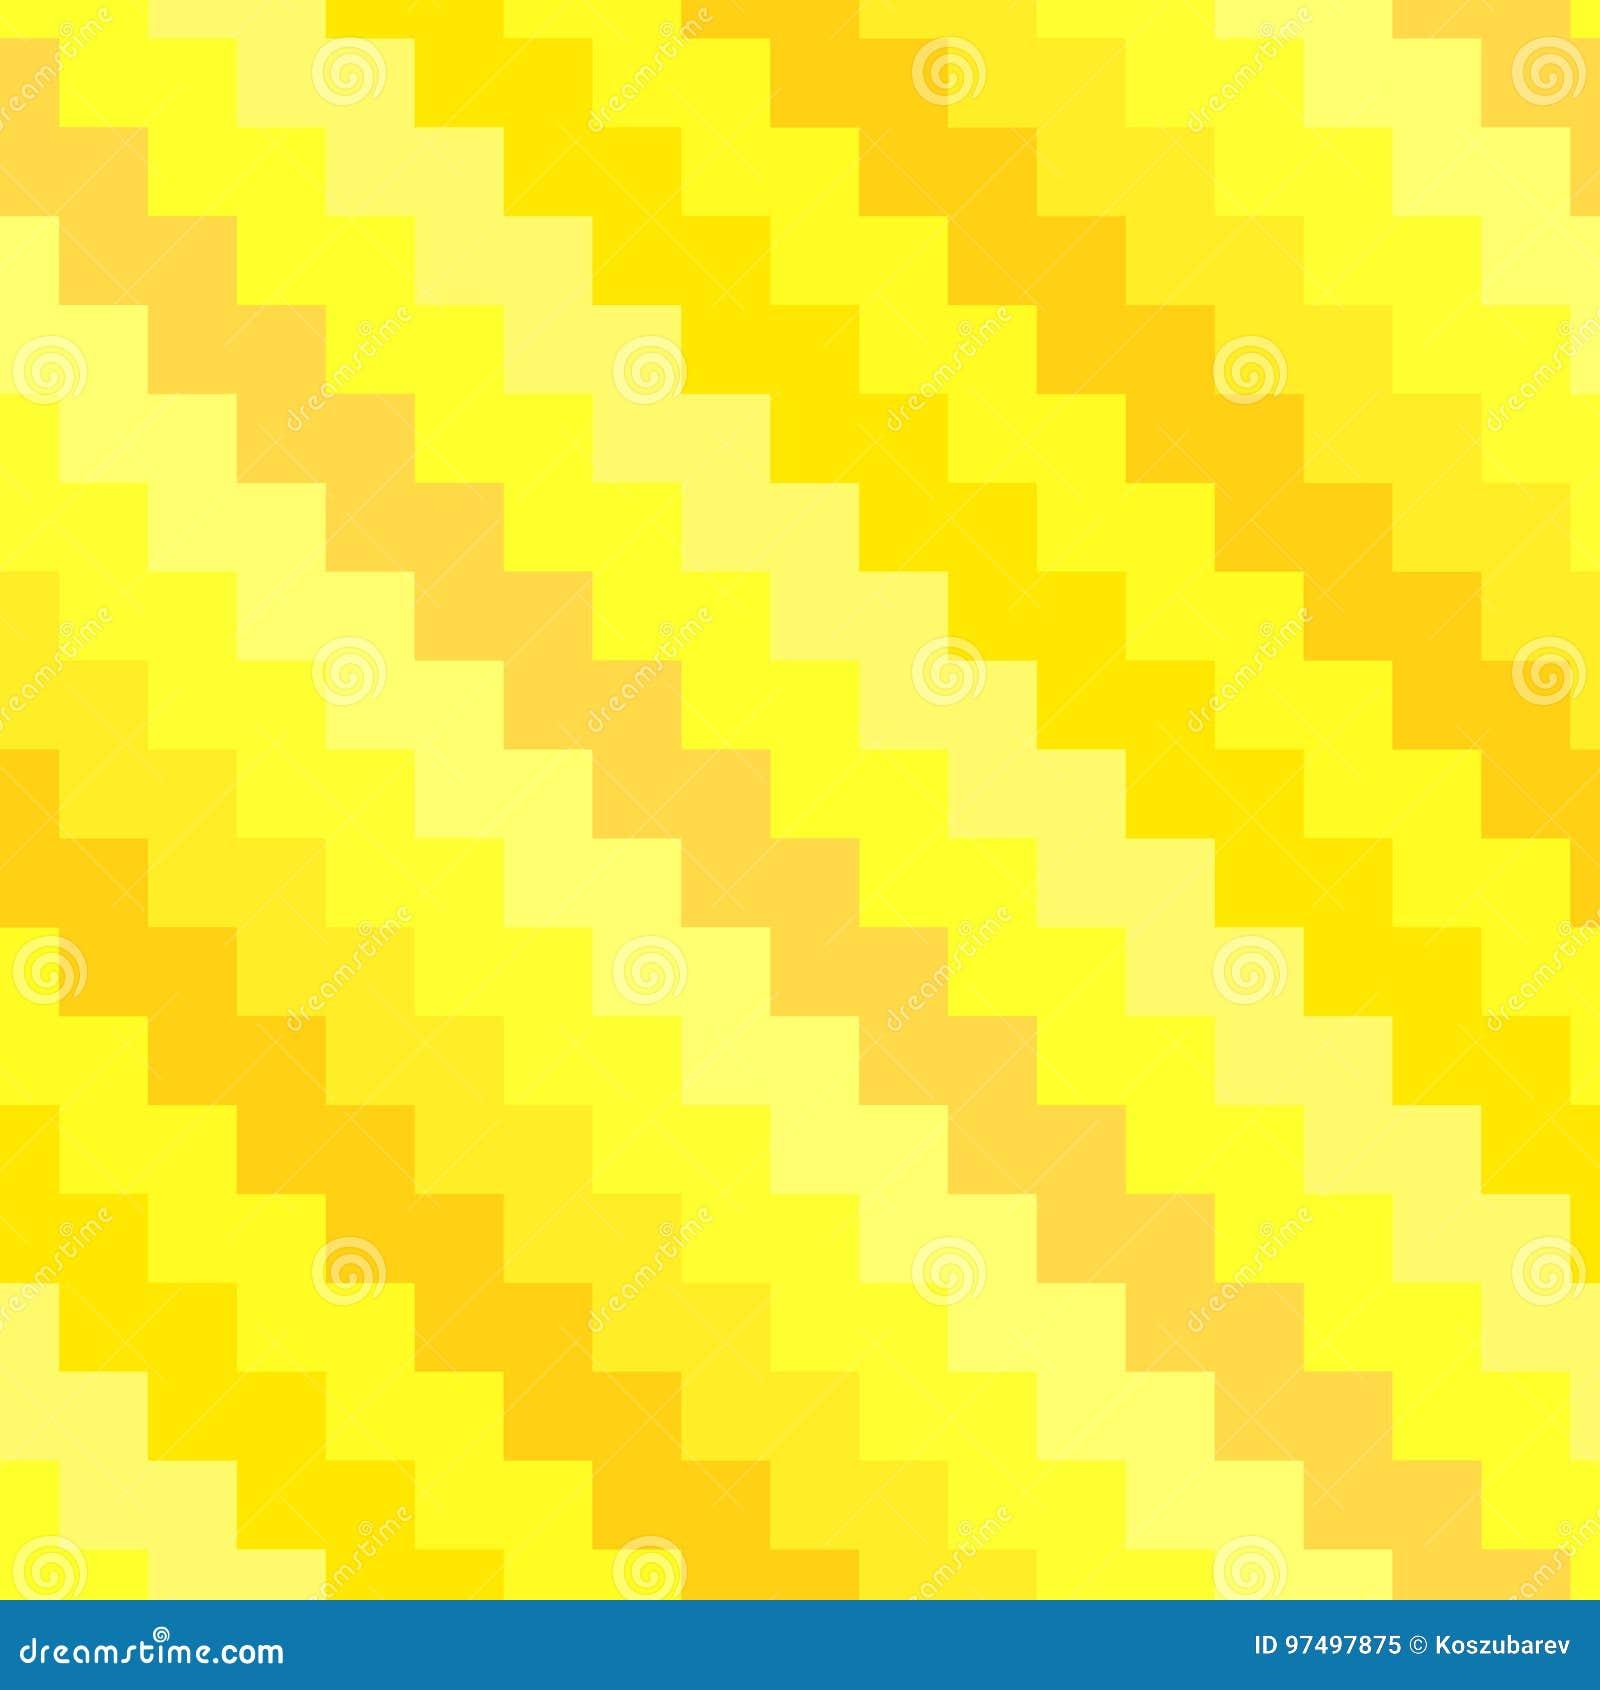 Modello senza cuciture a strisce diagonale